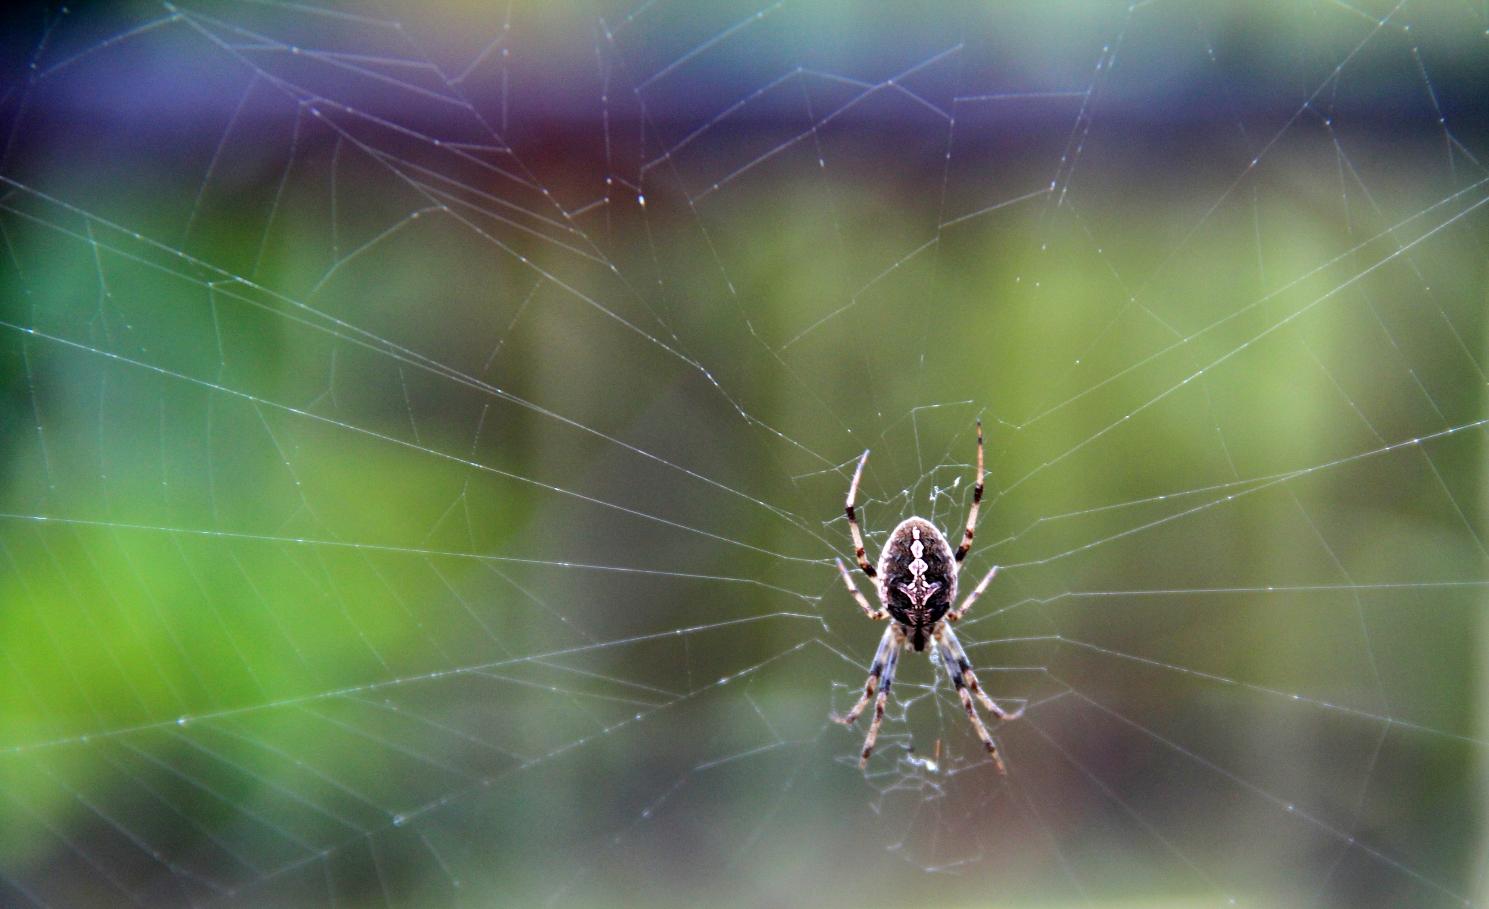 spider rain aug 2013 - Copy